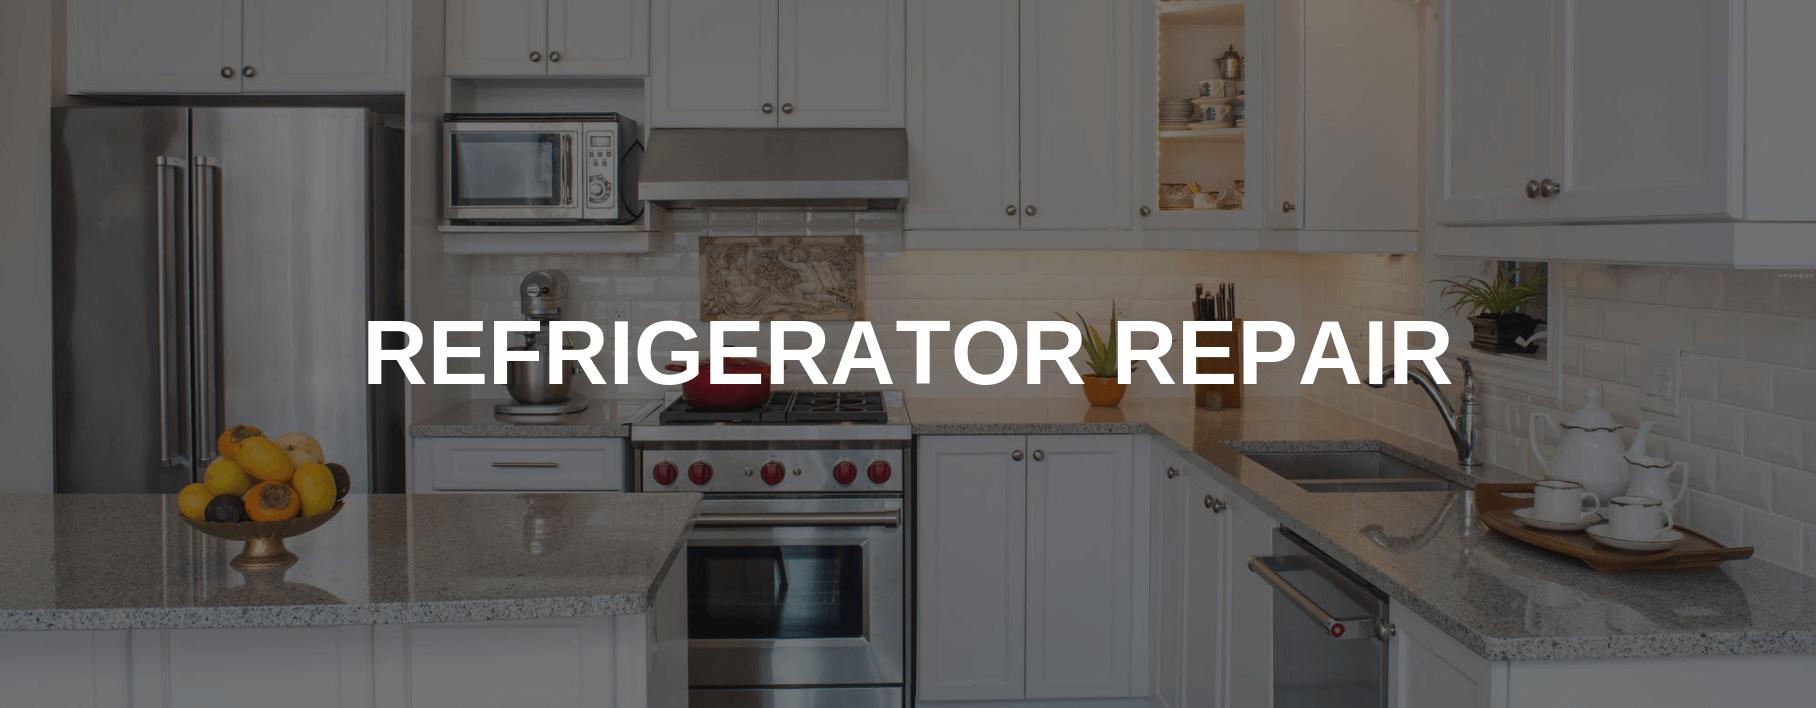 refrigerator repair edison